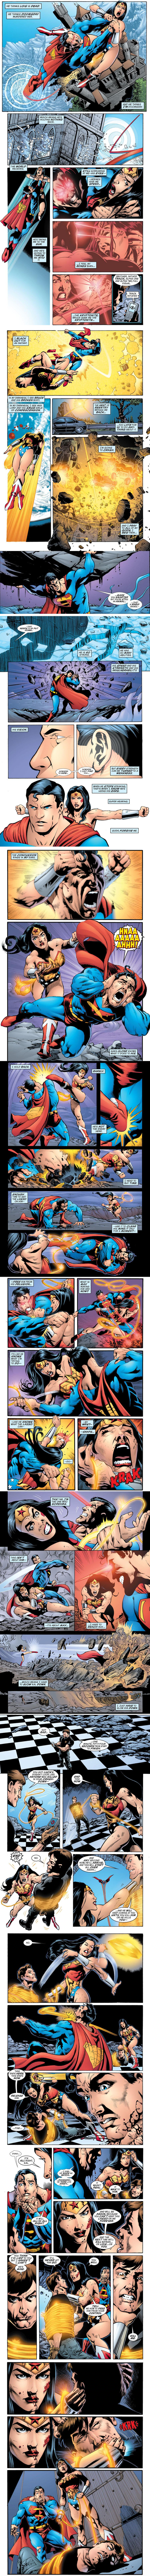 Wonder Woman Vs. Superman